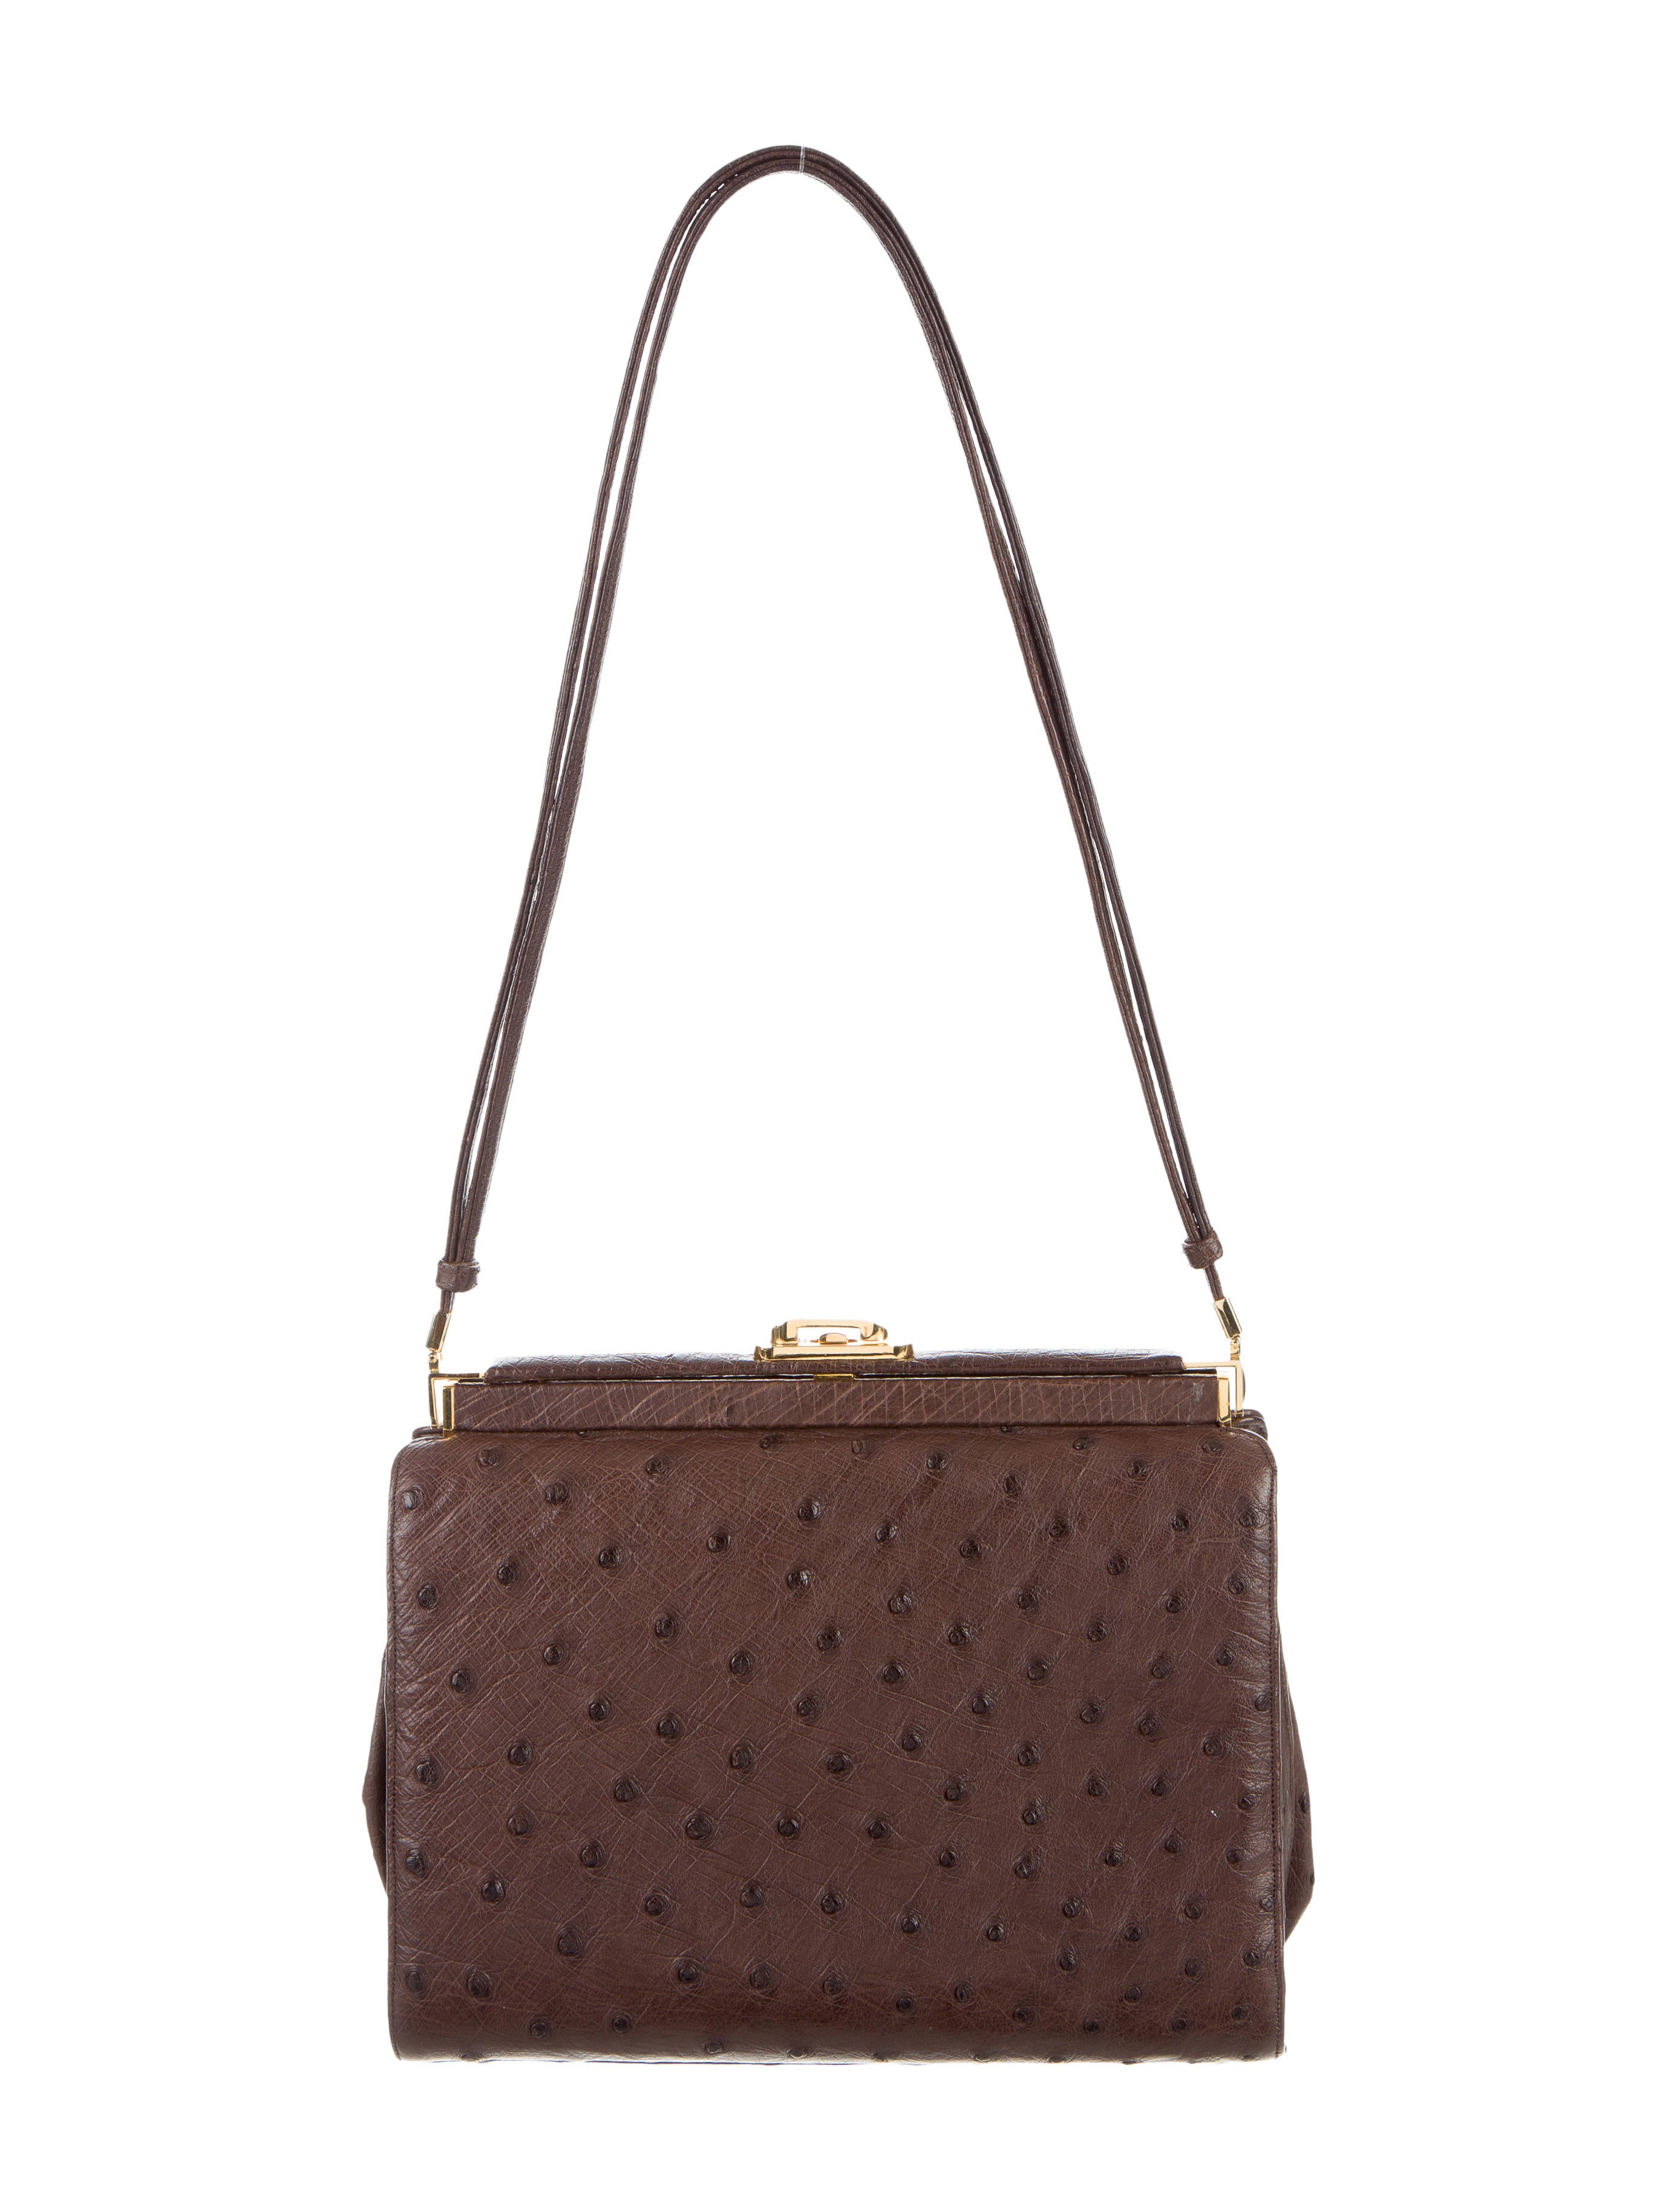 Judith Leiber Ostrich Shoulder Bag - Handbags